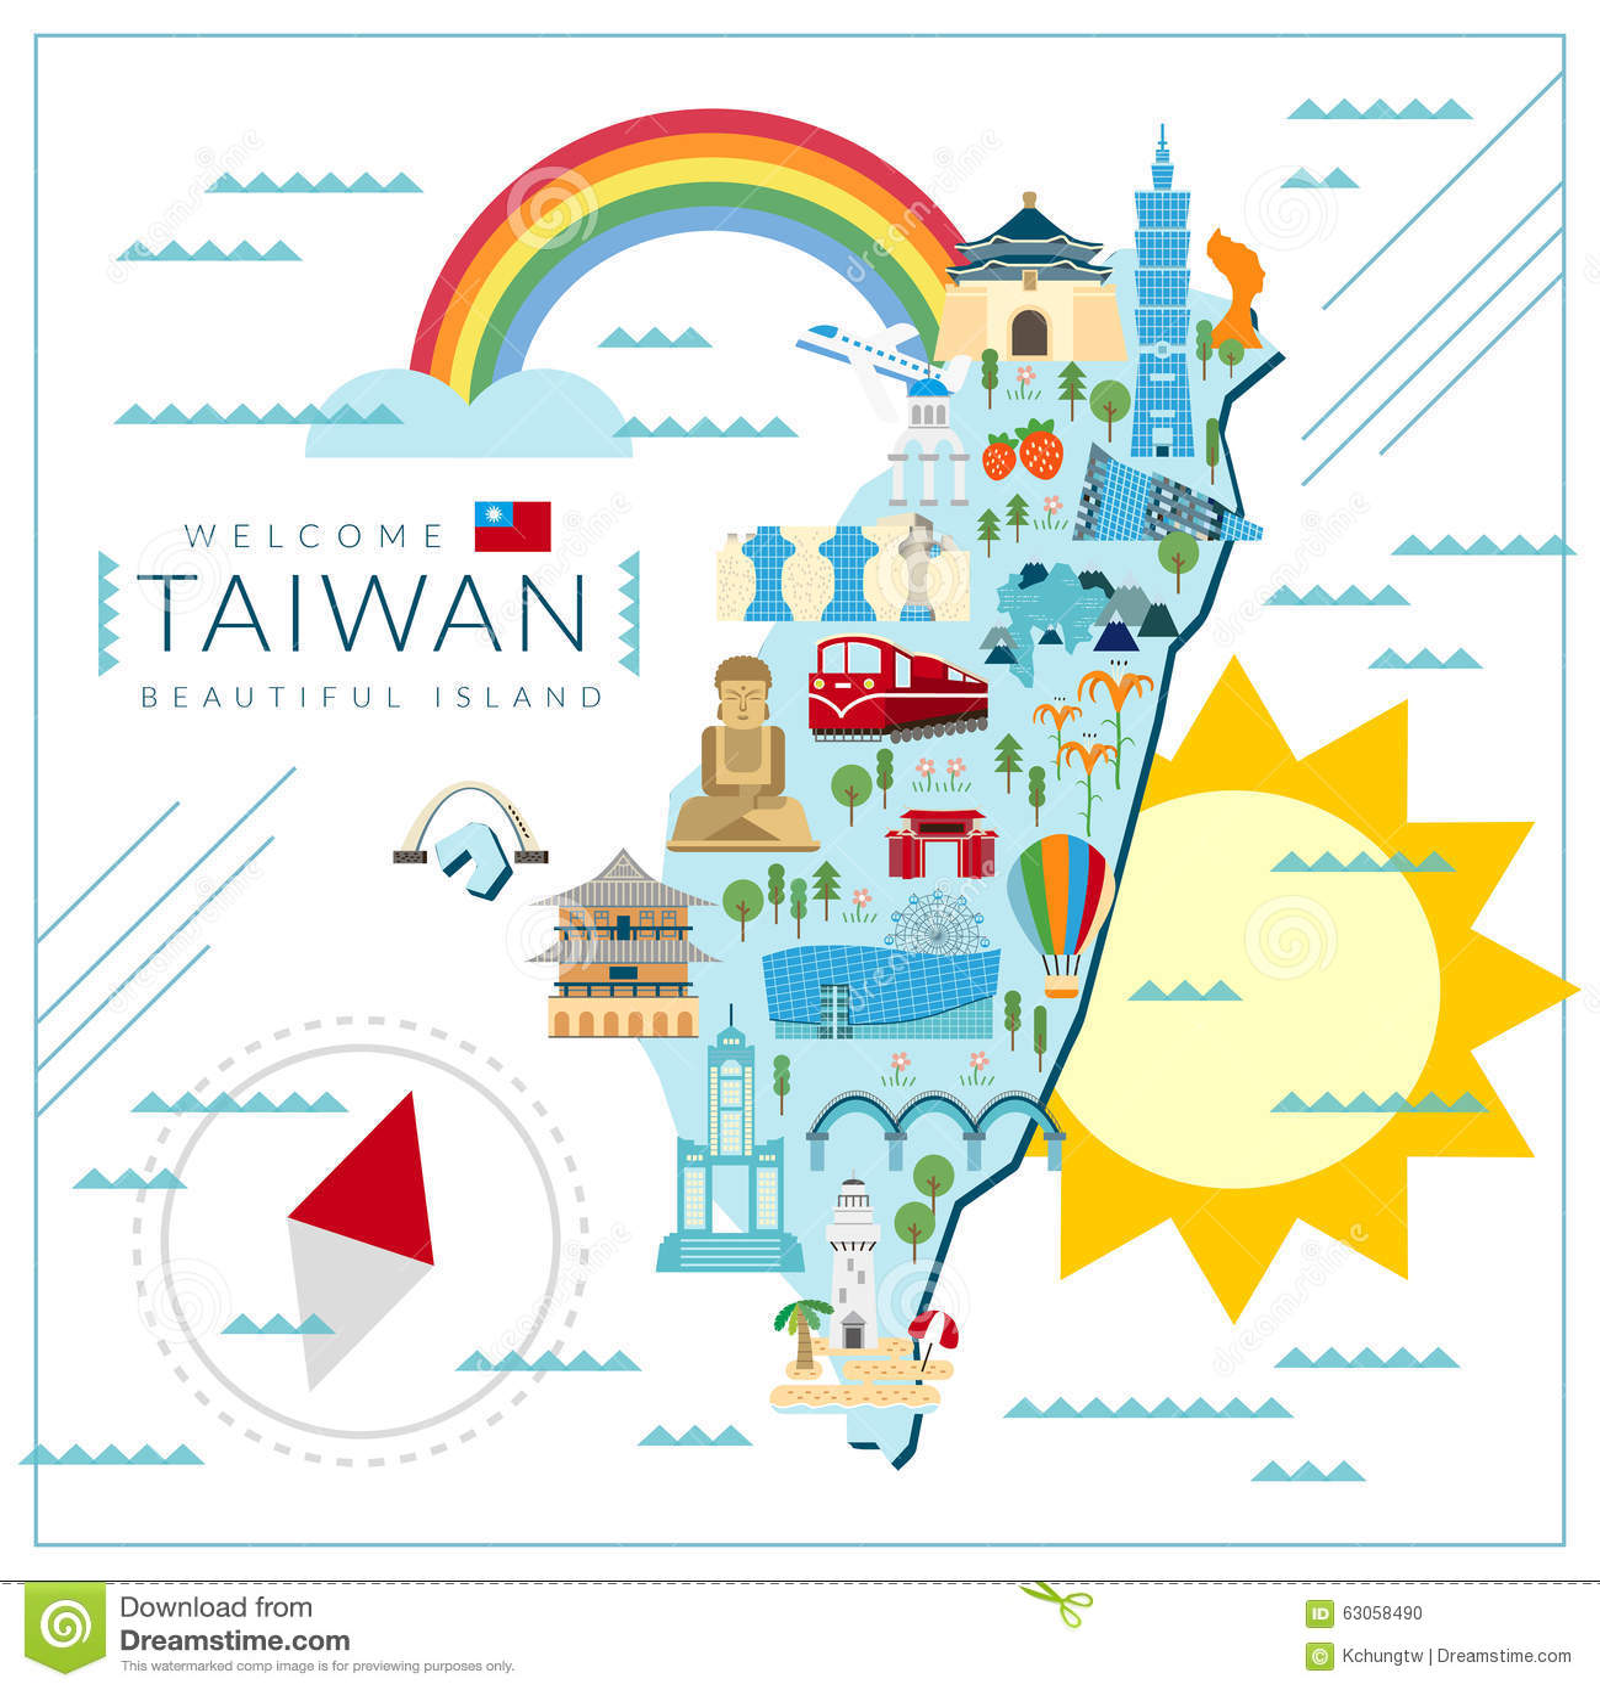 taiwan lovely